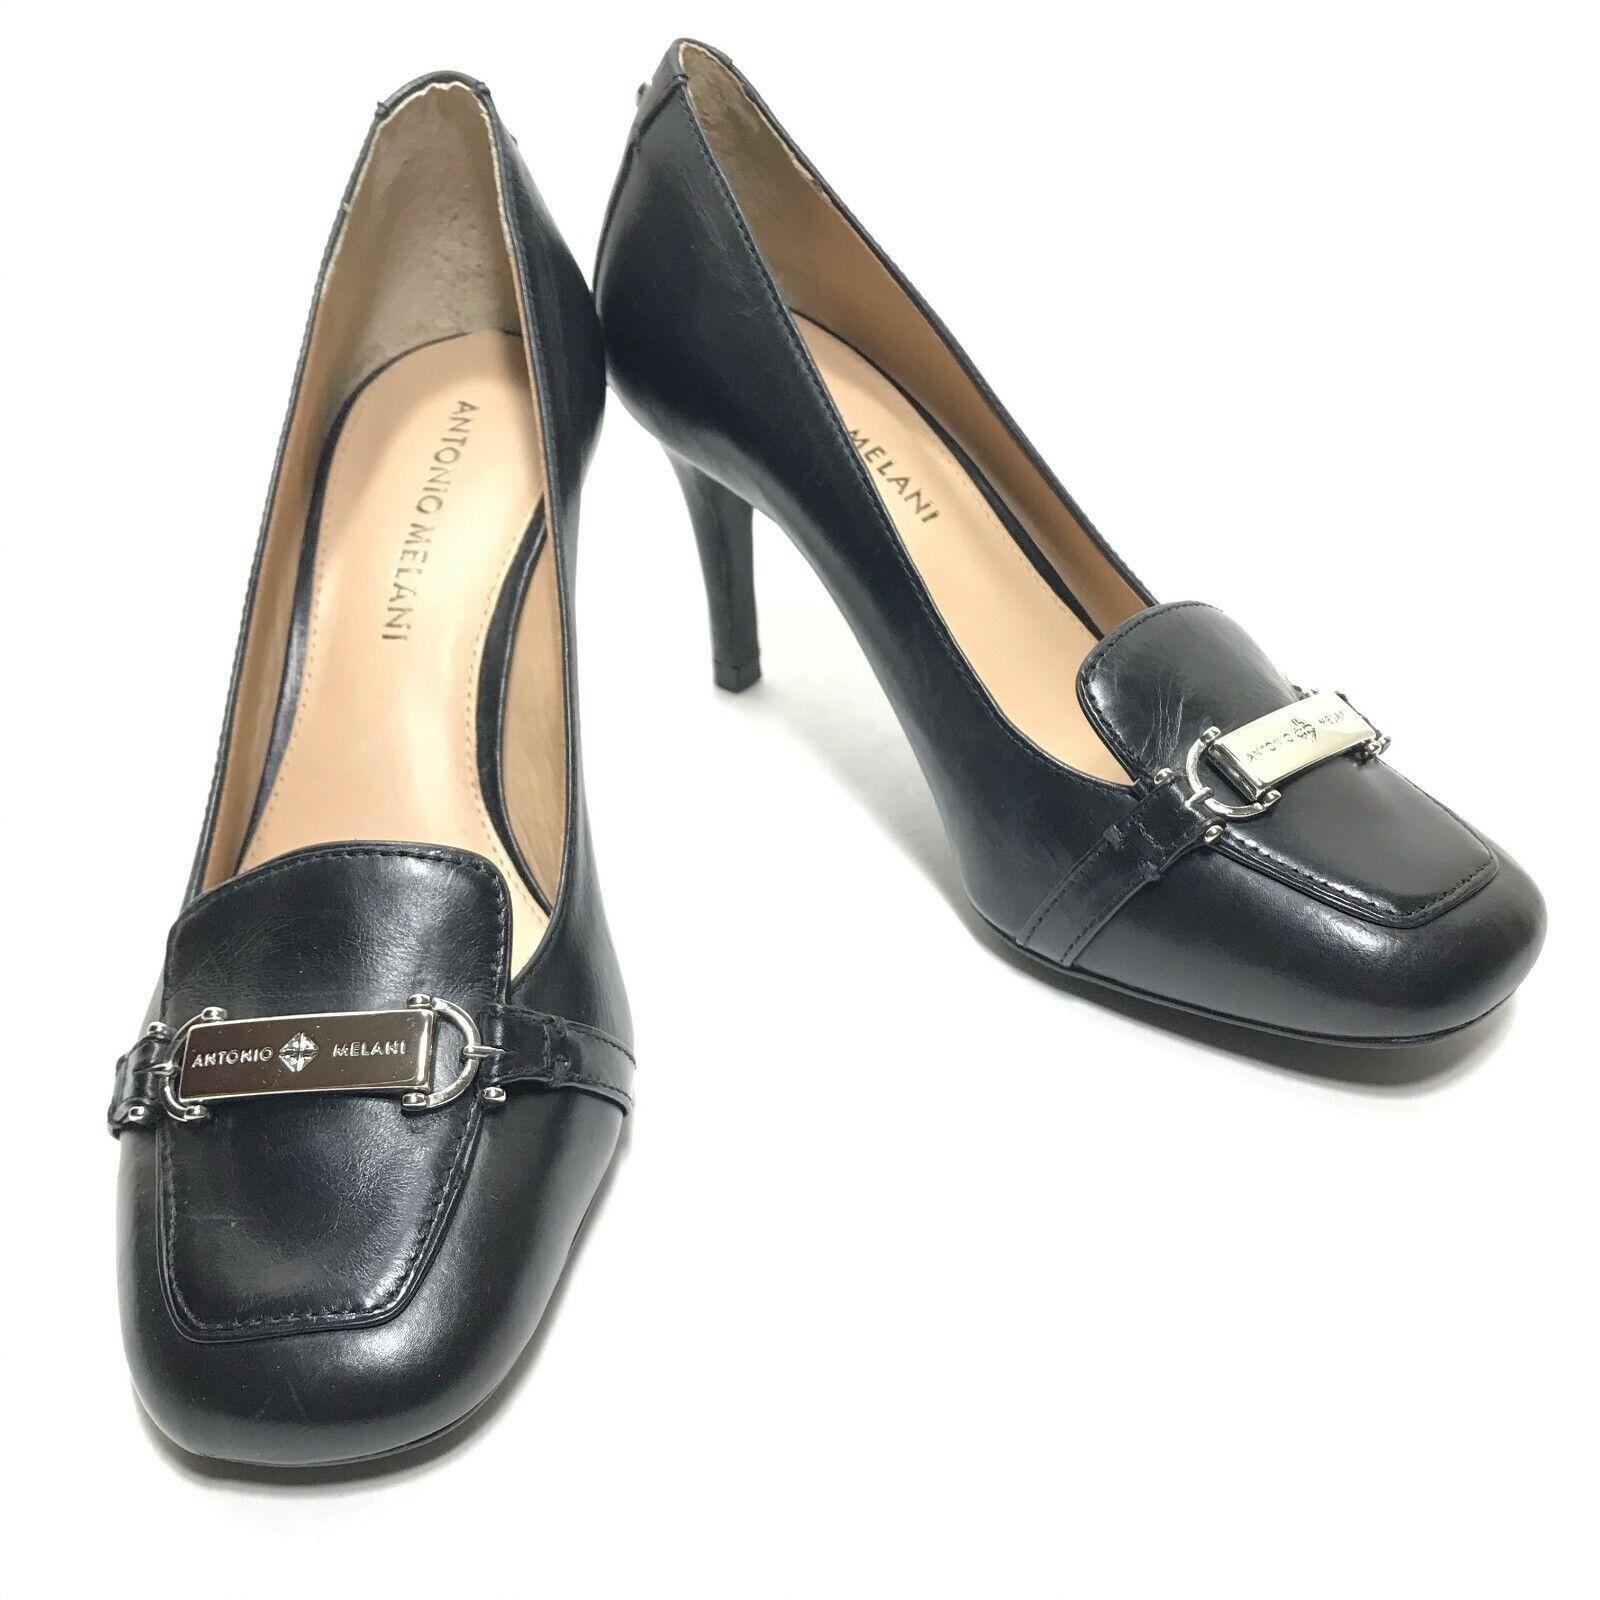 Women's Antonio Melani Black Leather Moc High Heel Pumps Size 7 M